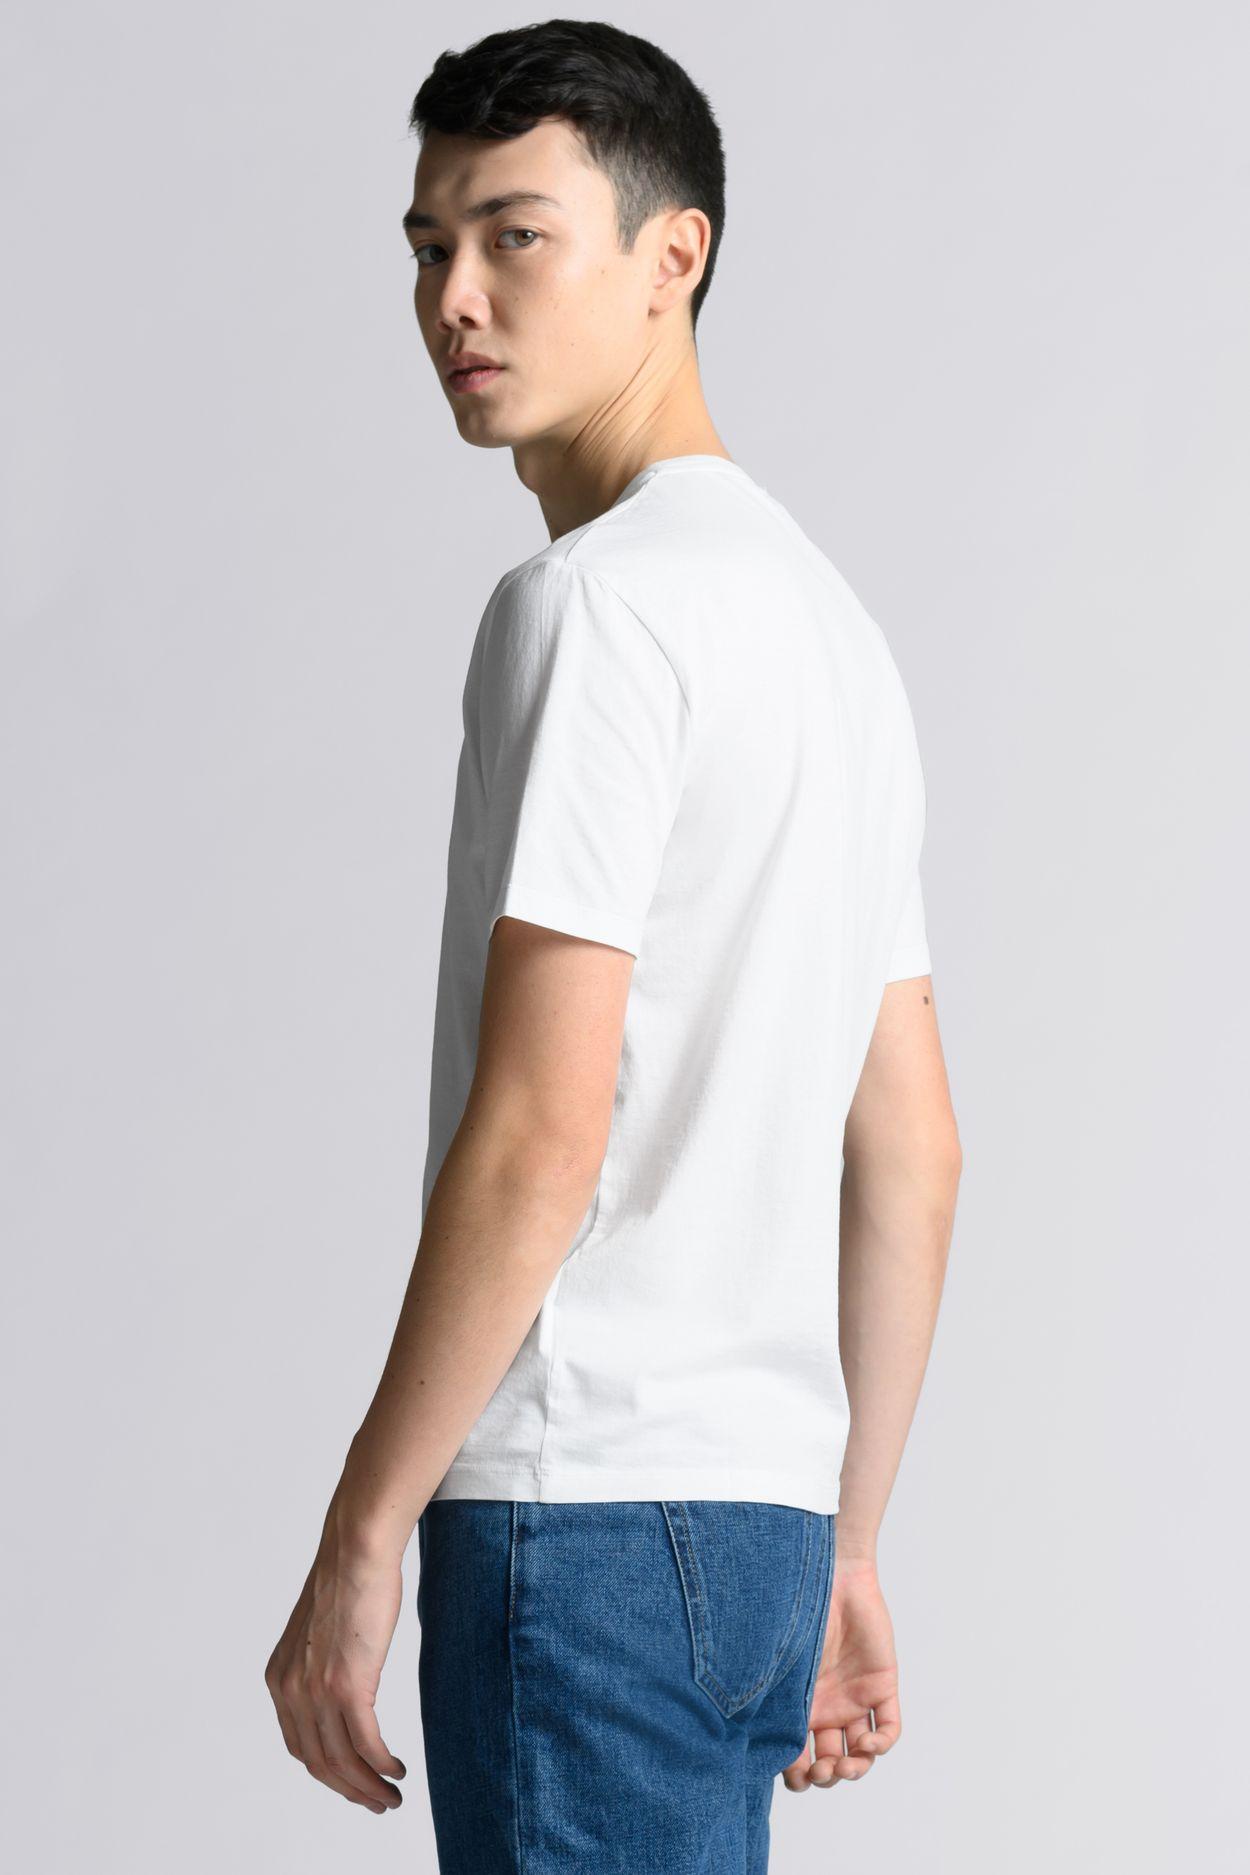 White Lightweight T-Shirt | ELS Cotton Crewneck - ASKET